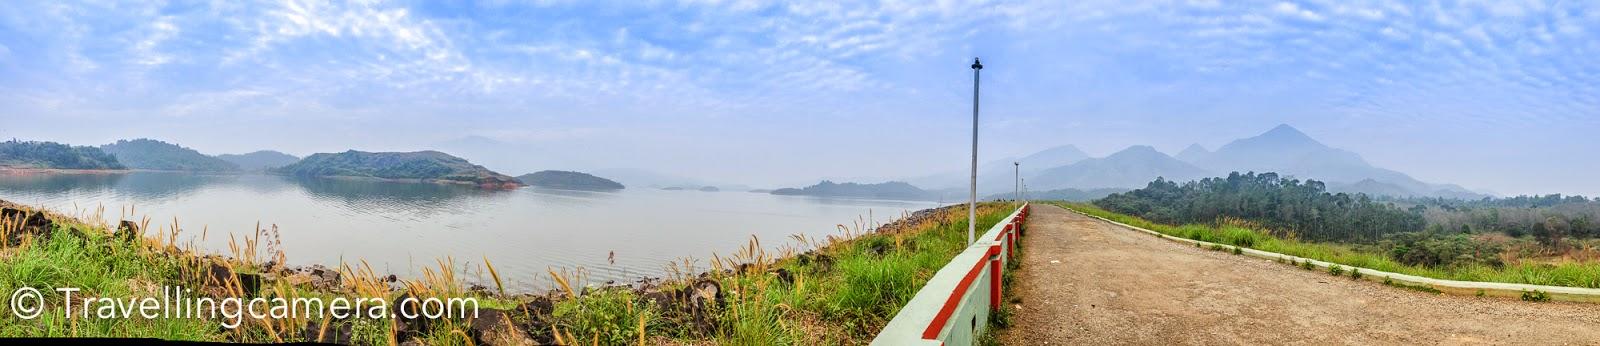 A view of Banasura sagar dam in Wayanad region of North Kerala.